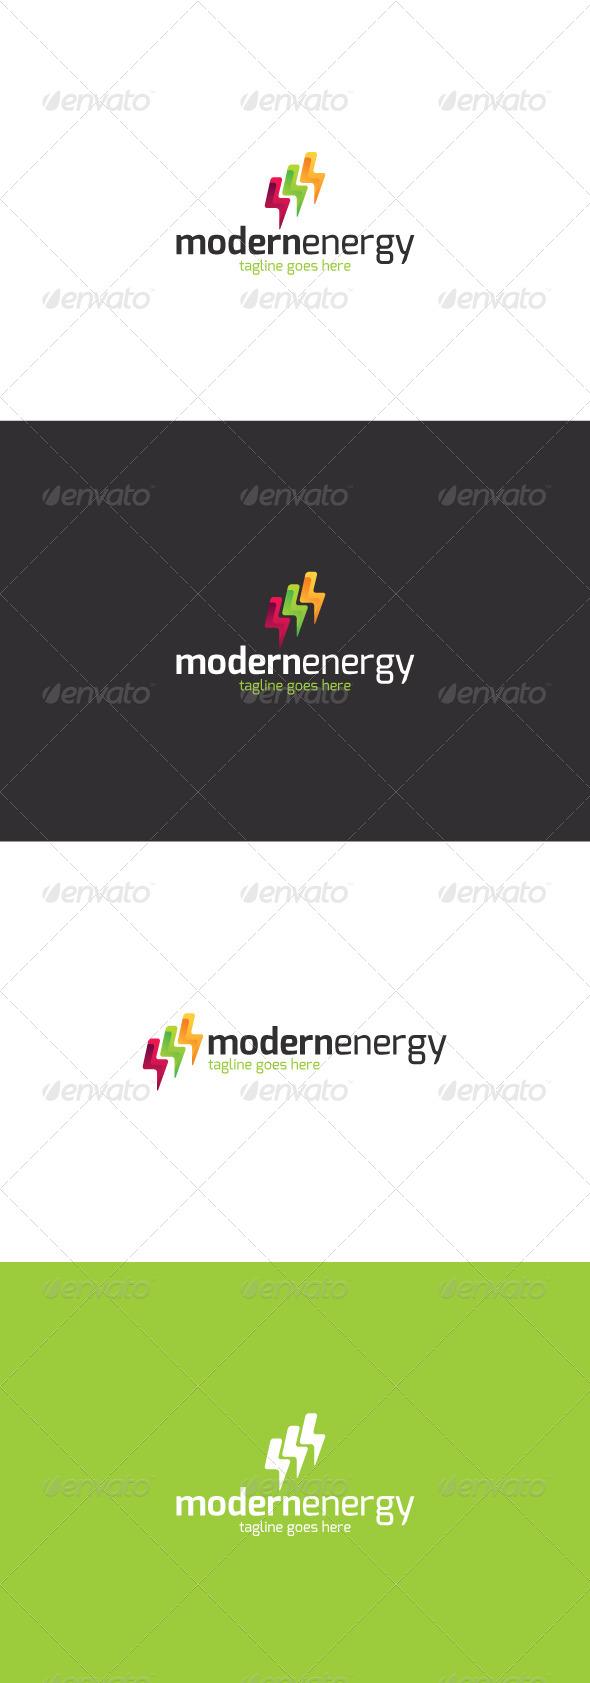 GraphicRiver Modern Energy Logo 8366809